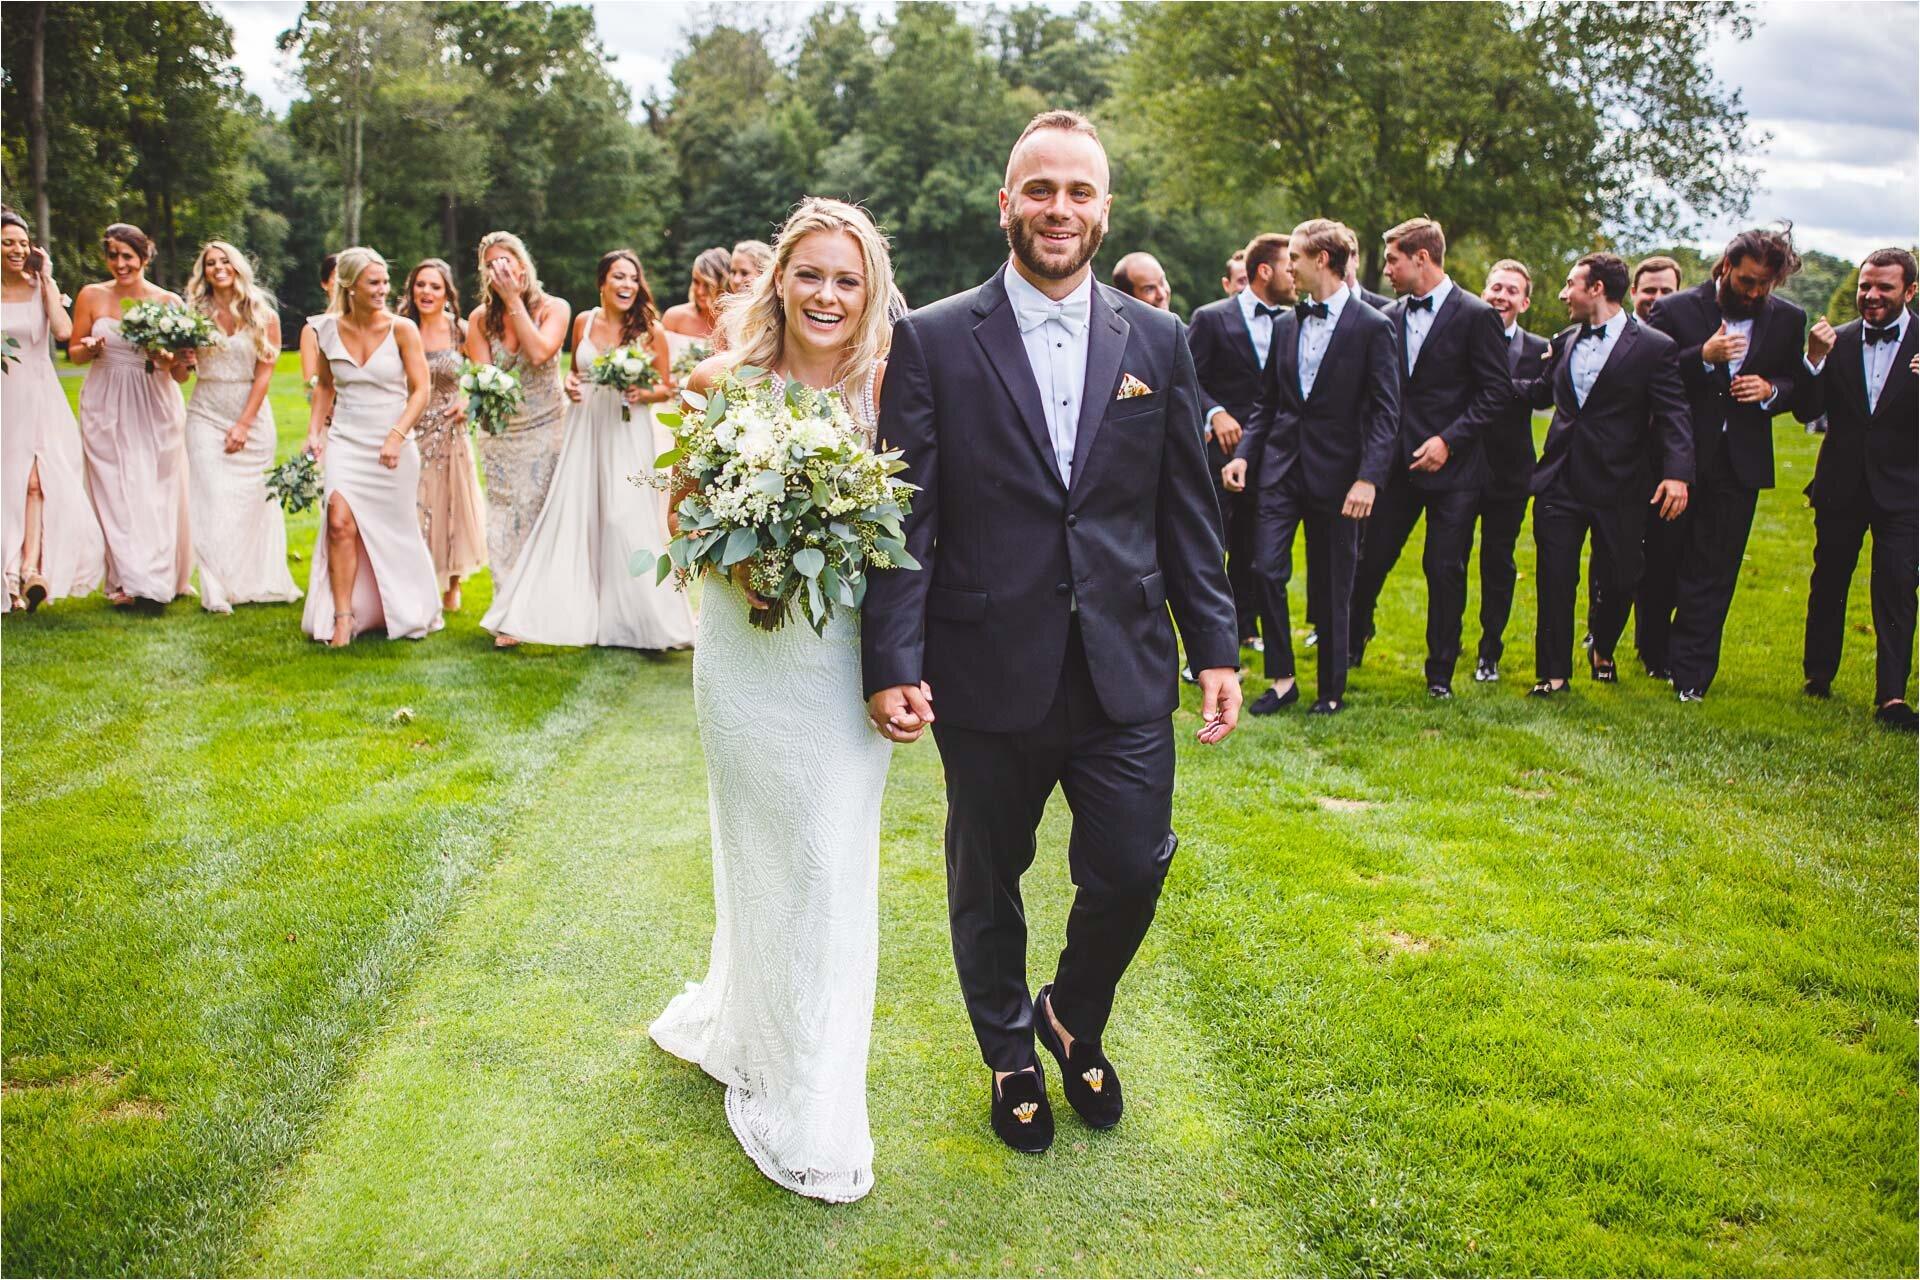 racebrook-countryclub-wedding-photography-21.jpg